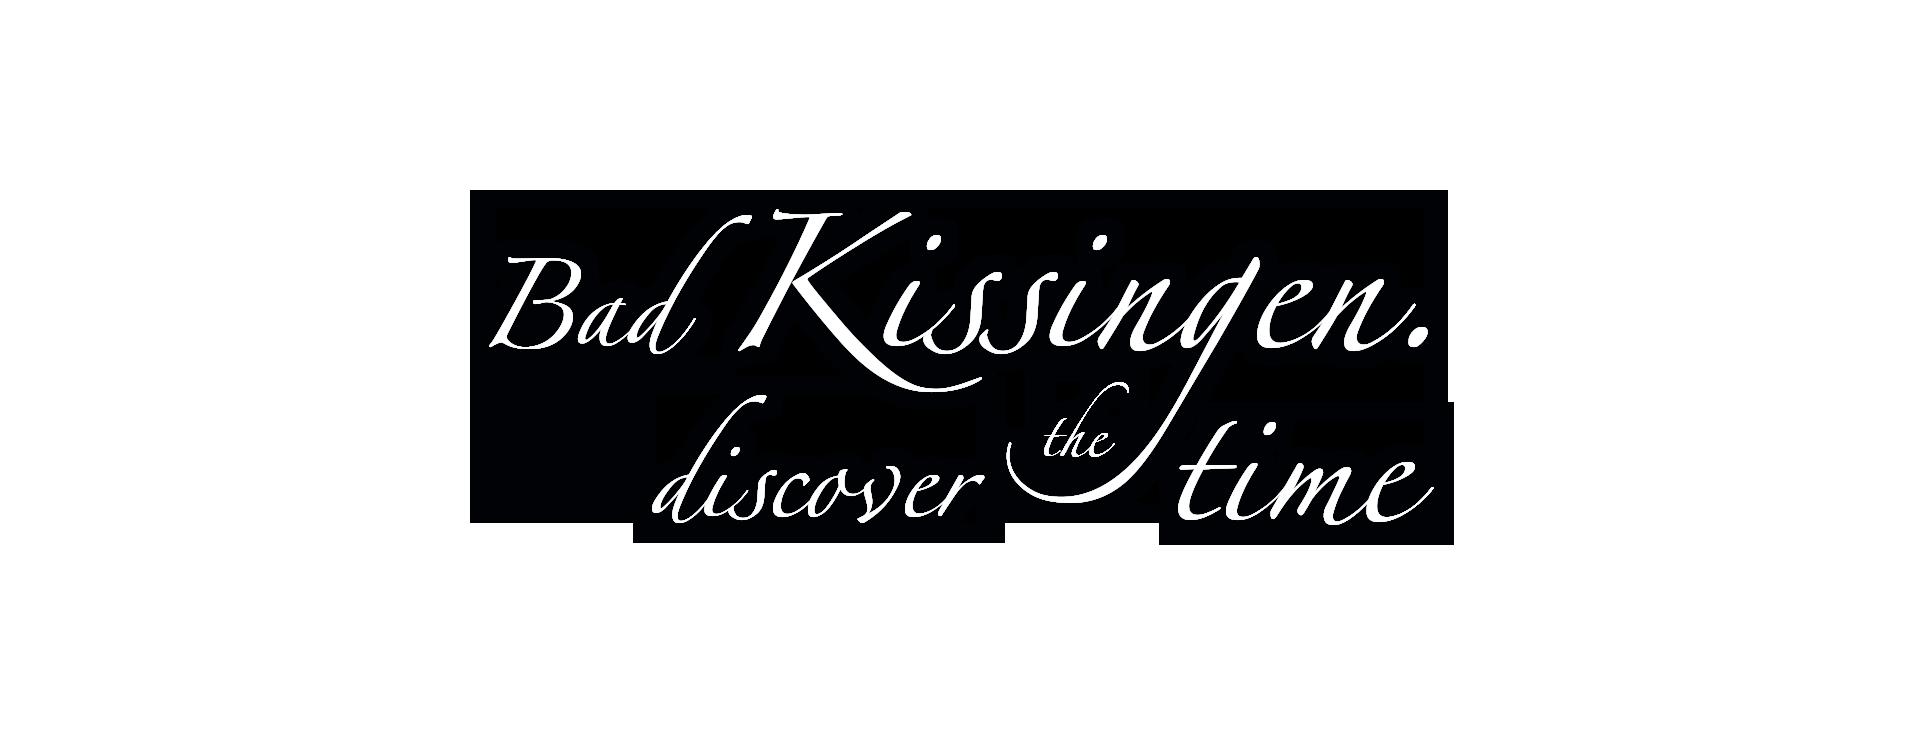 Claim Bad Kissingen 4